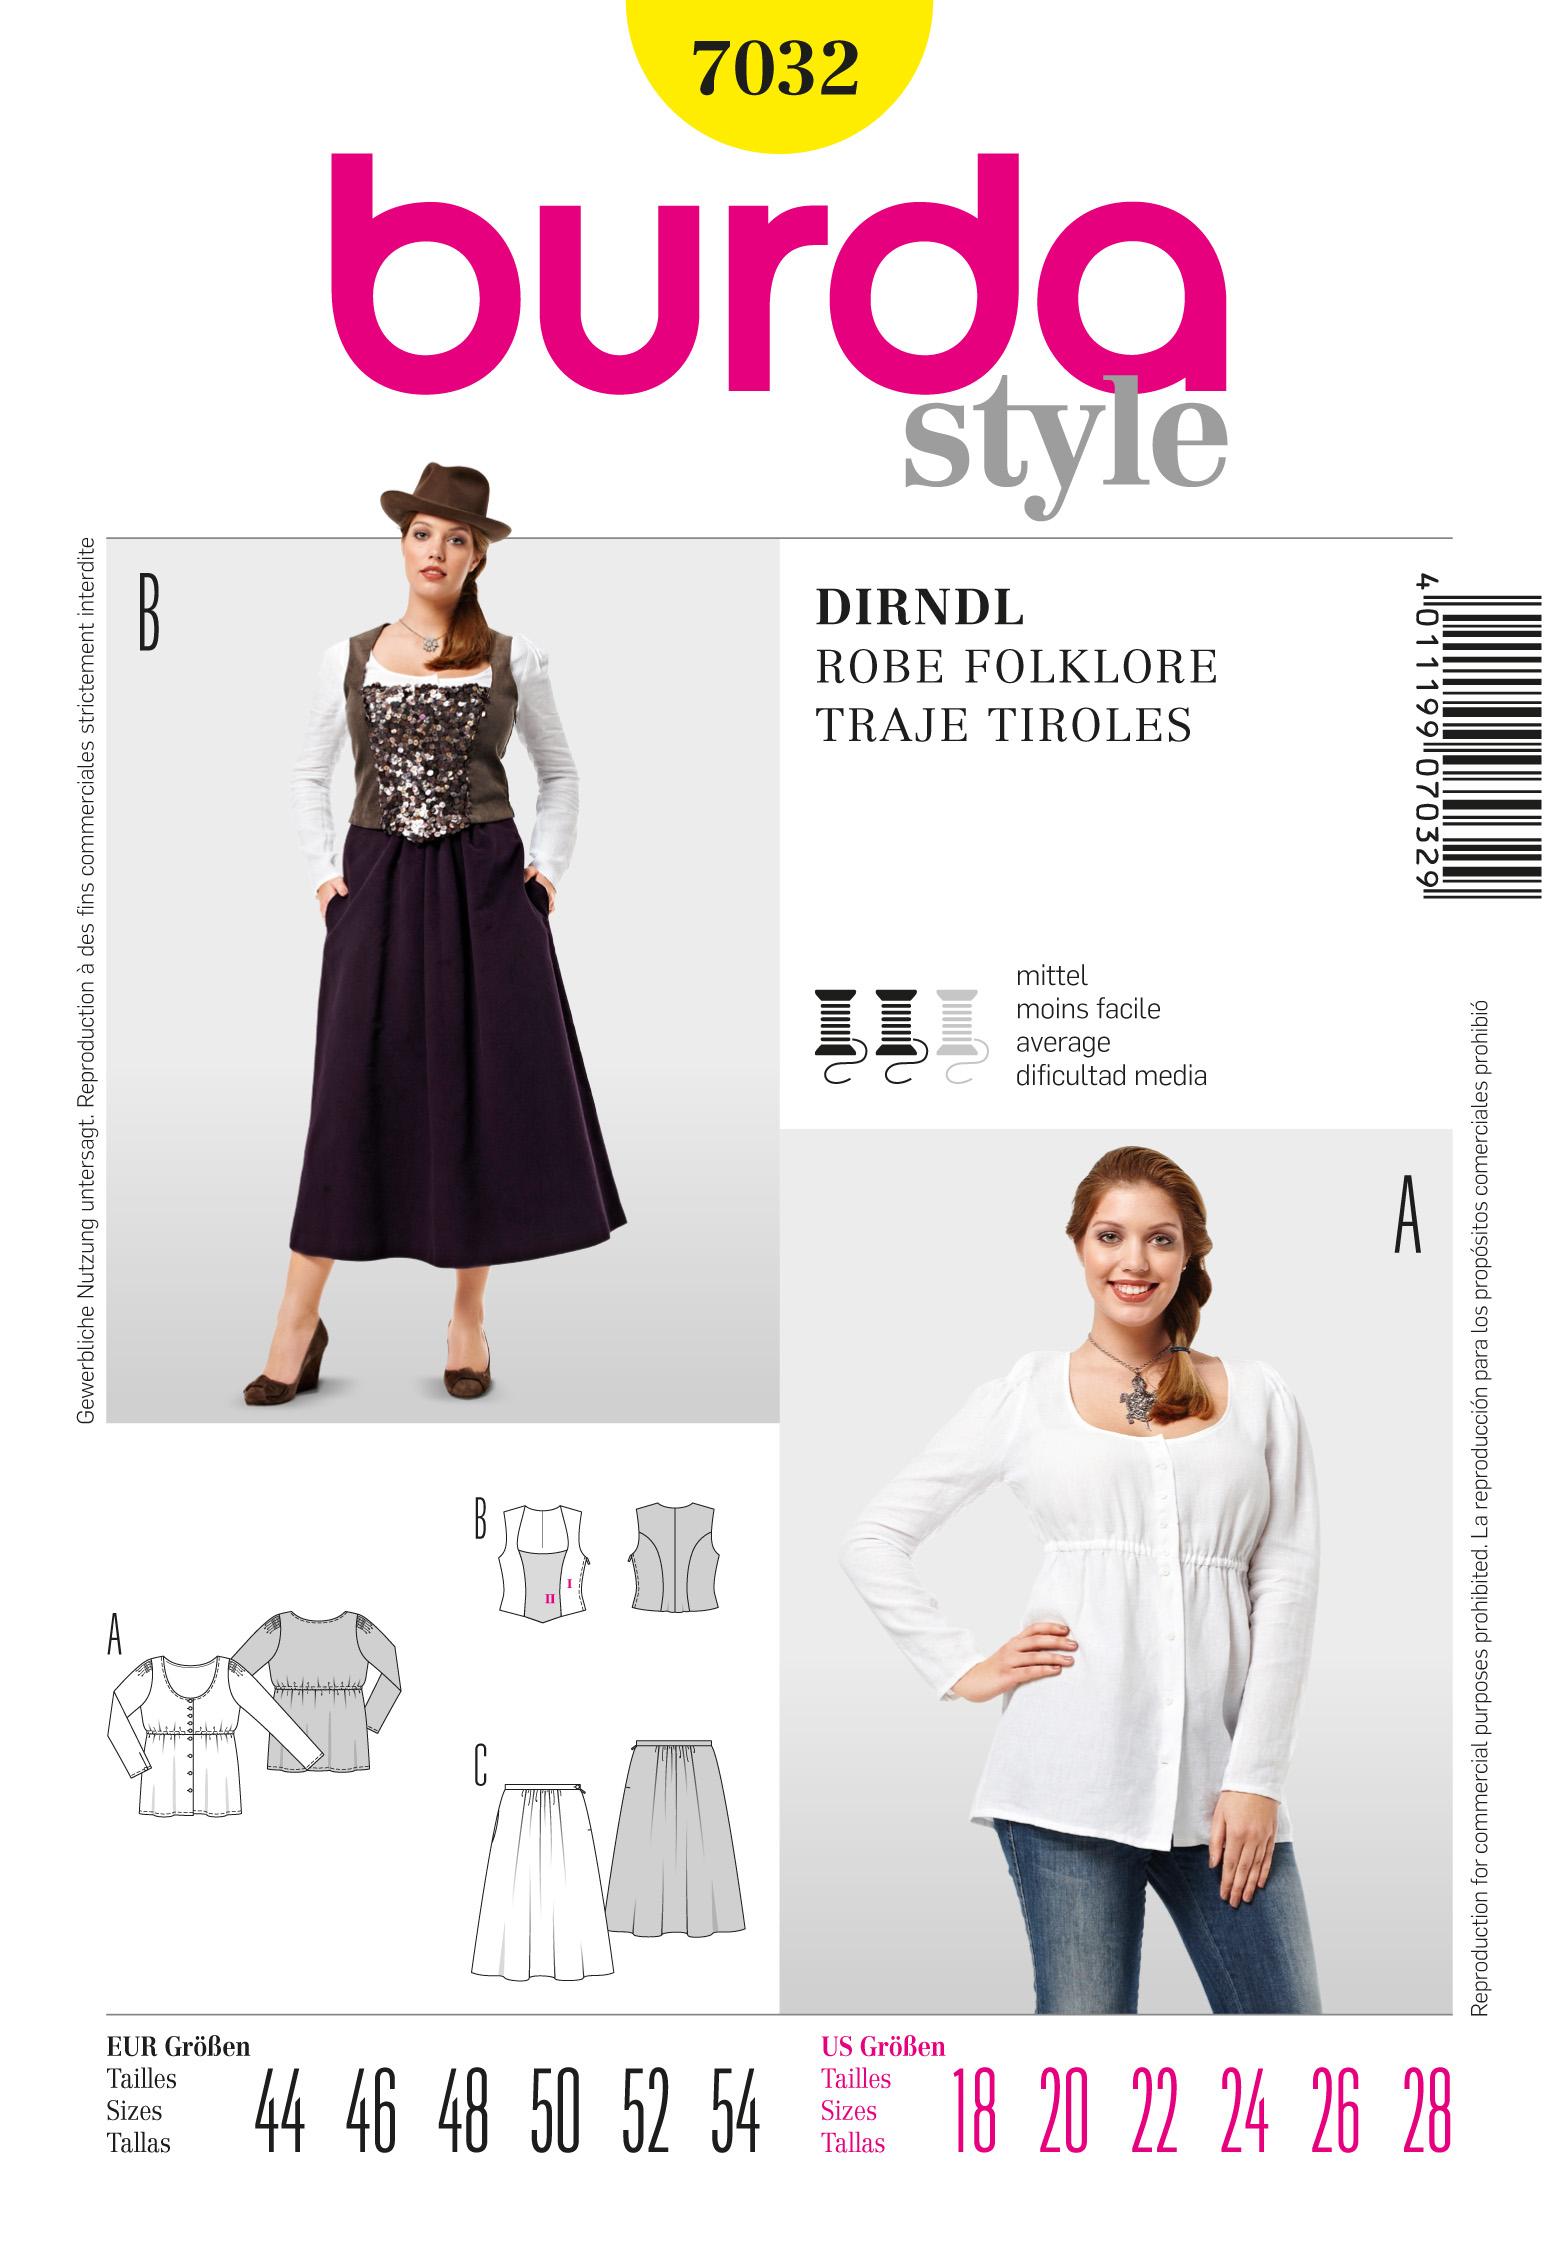 Burda Dirndl Traditional Skirt 7032